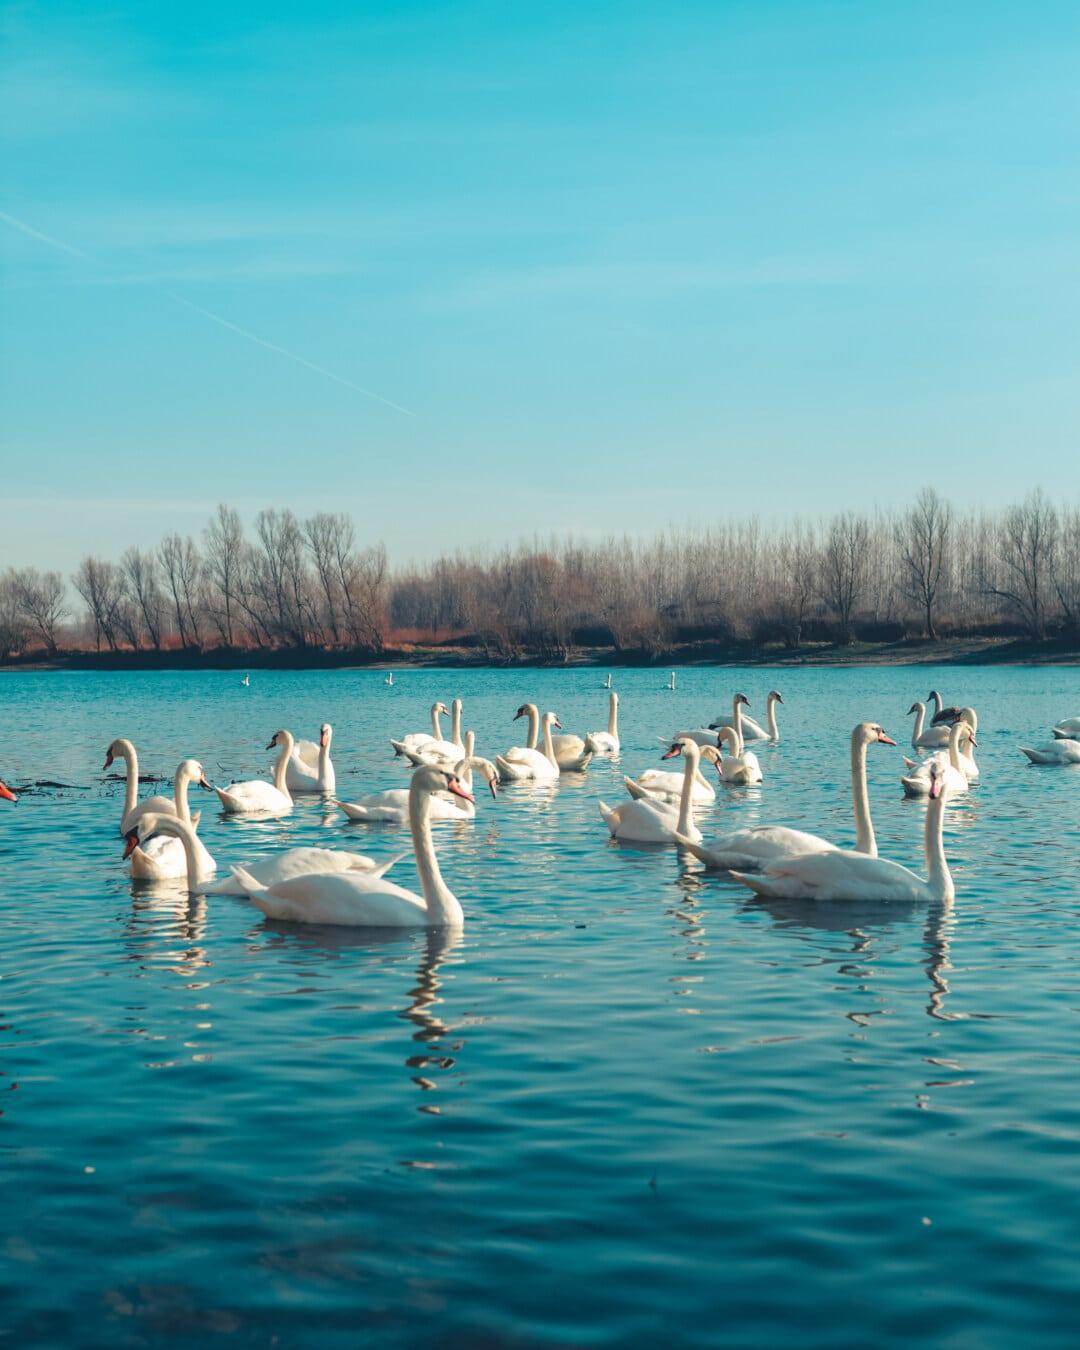 Herde, Vogel-Familie, Vögel, Schwan, Danube, Fluss, Wasser, Horizont, Reflexion, viele